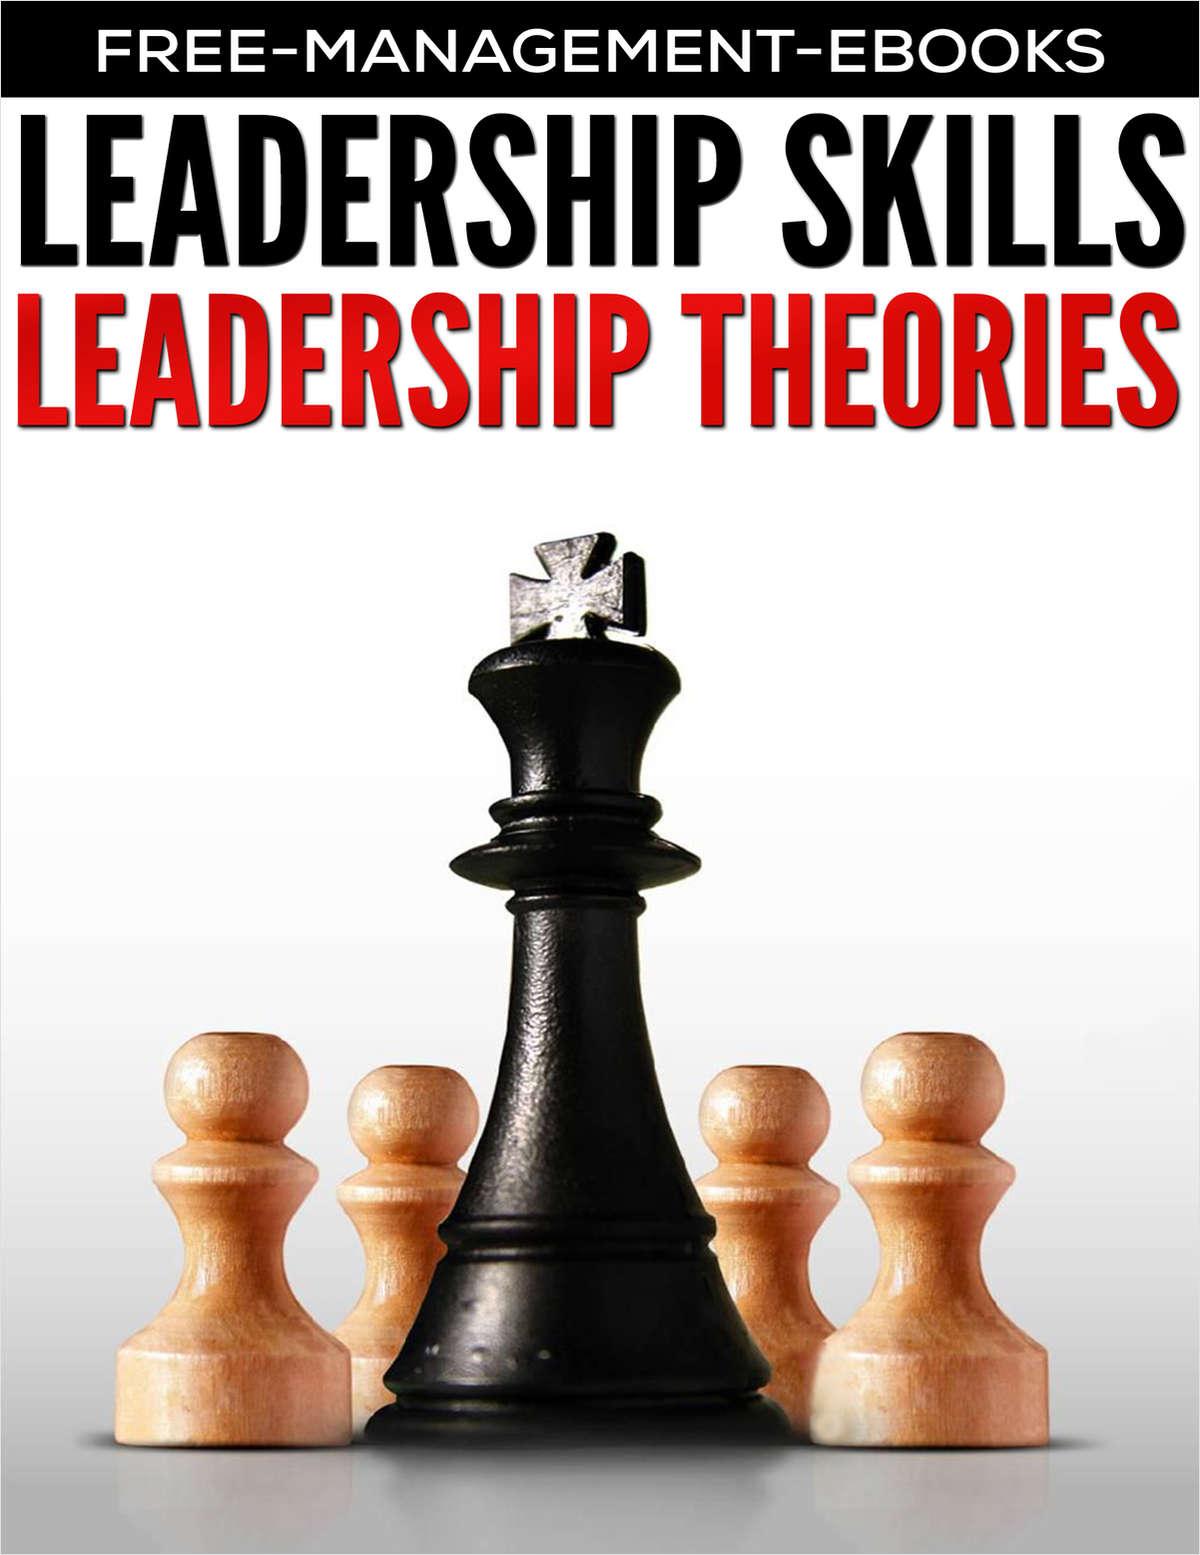 Leadership Theories - Developing Your Leadership Skills